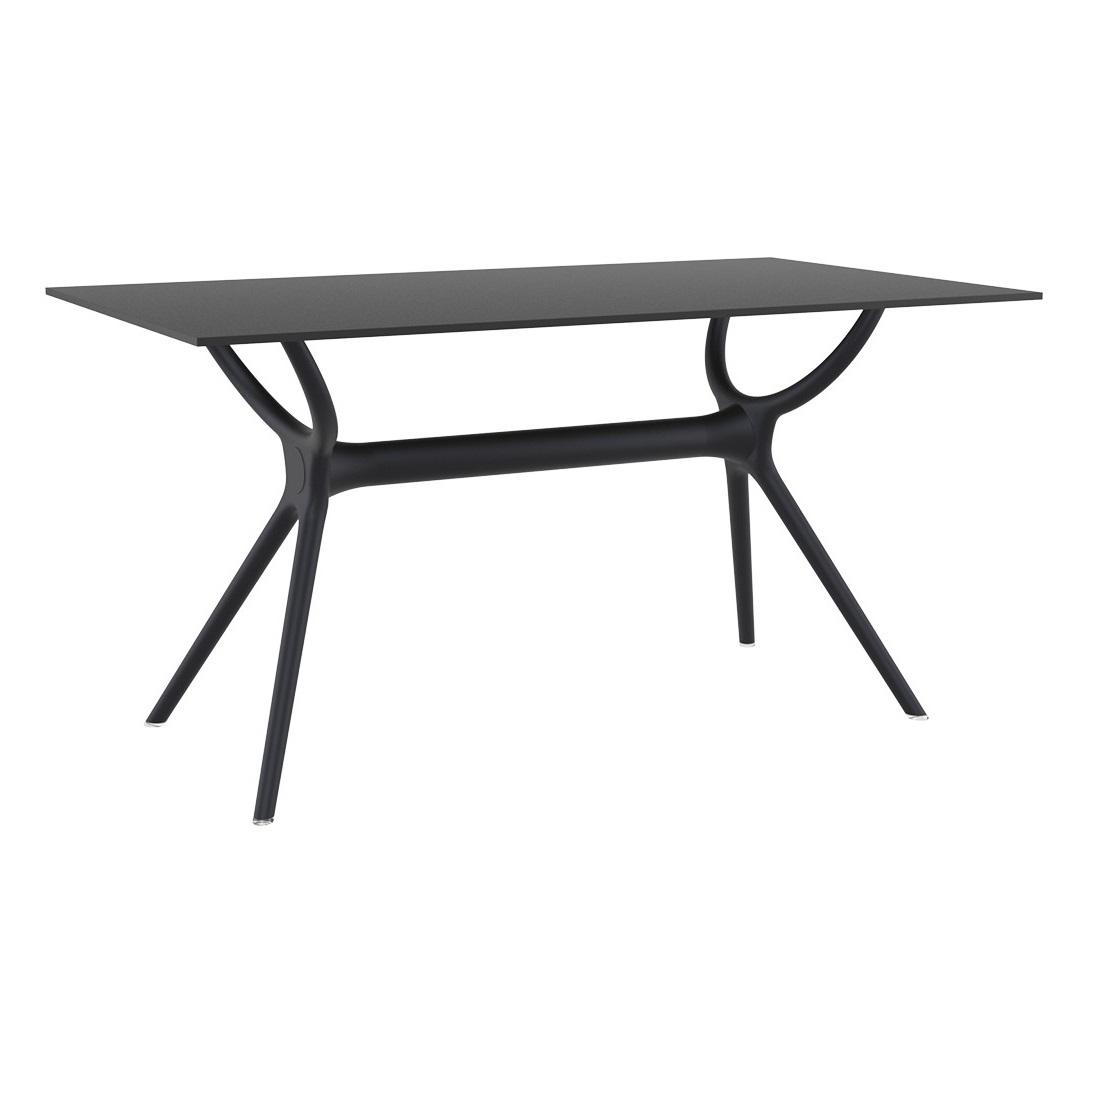 Pair 140 Table